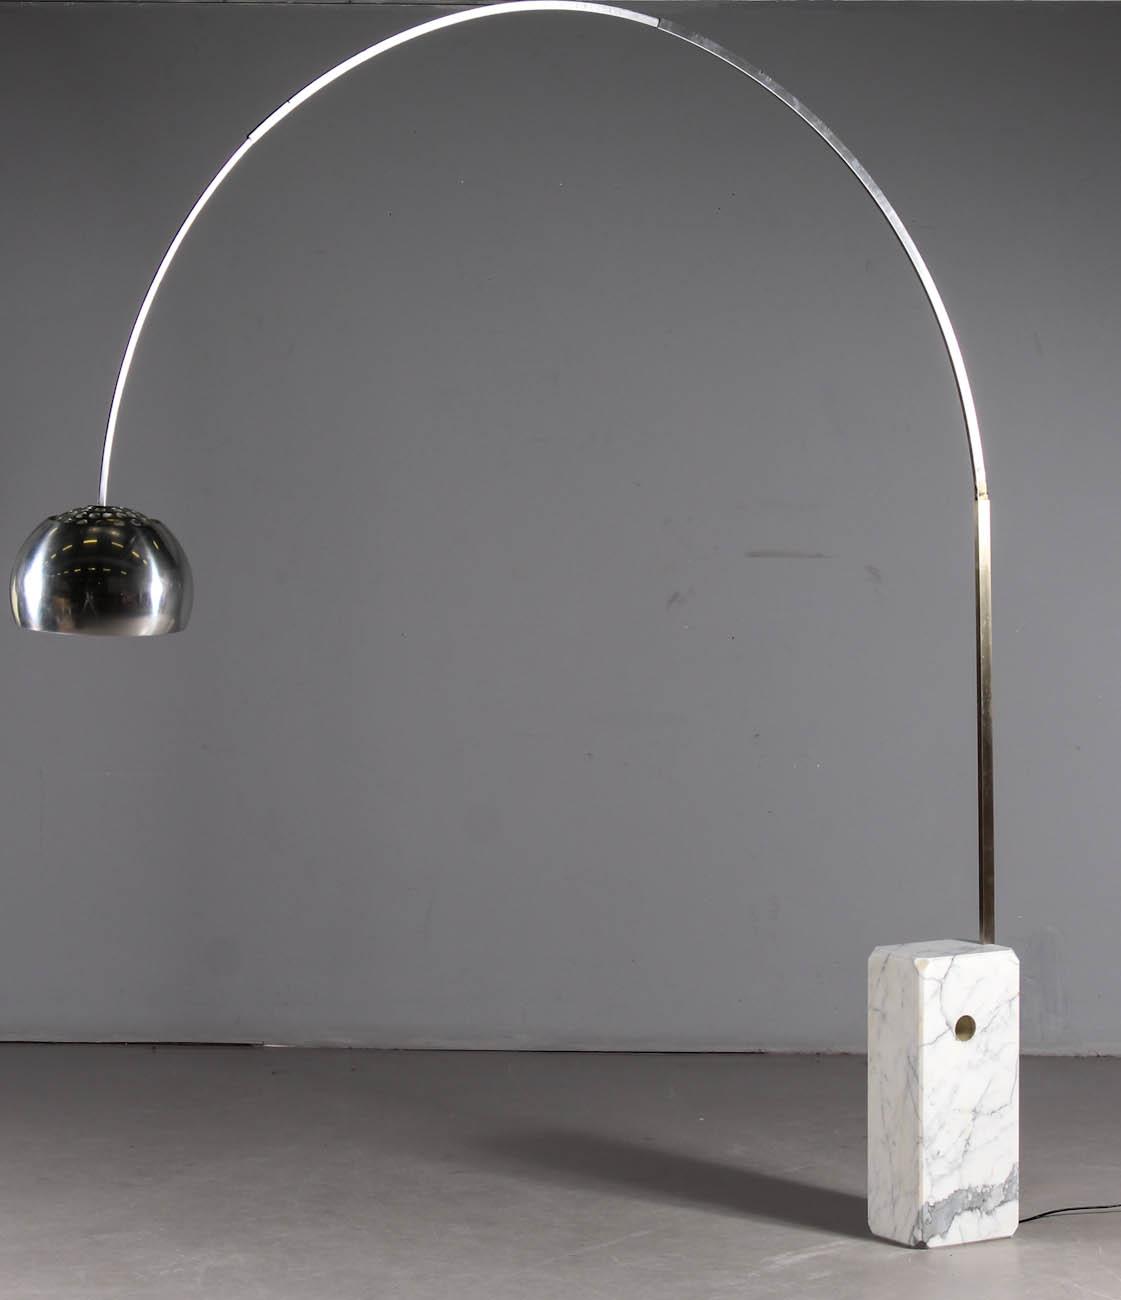 Forum classici del design lampada arco for Lampada arco